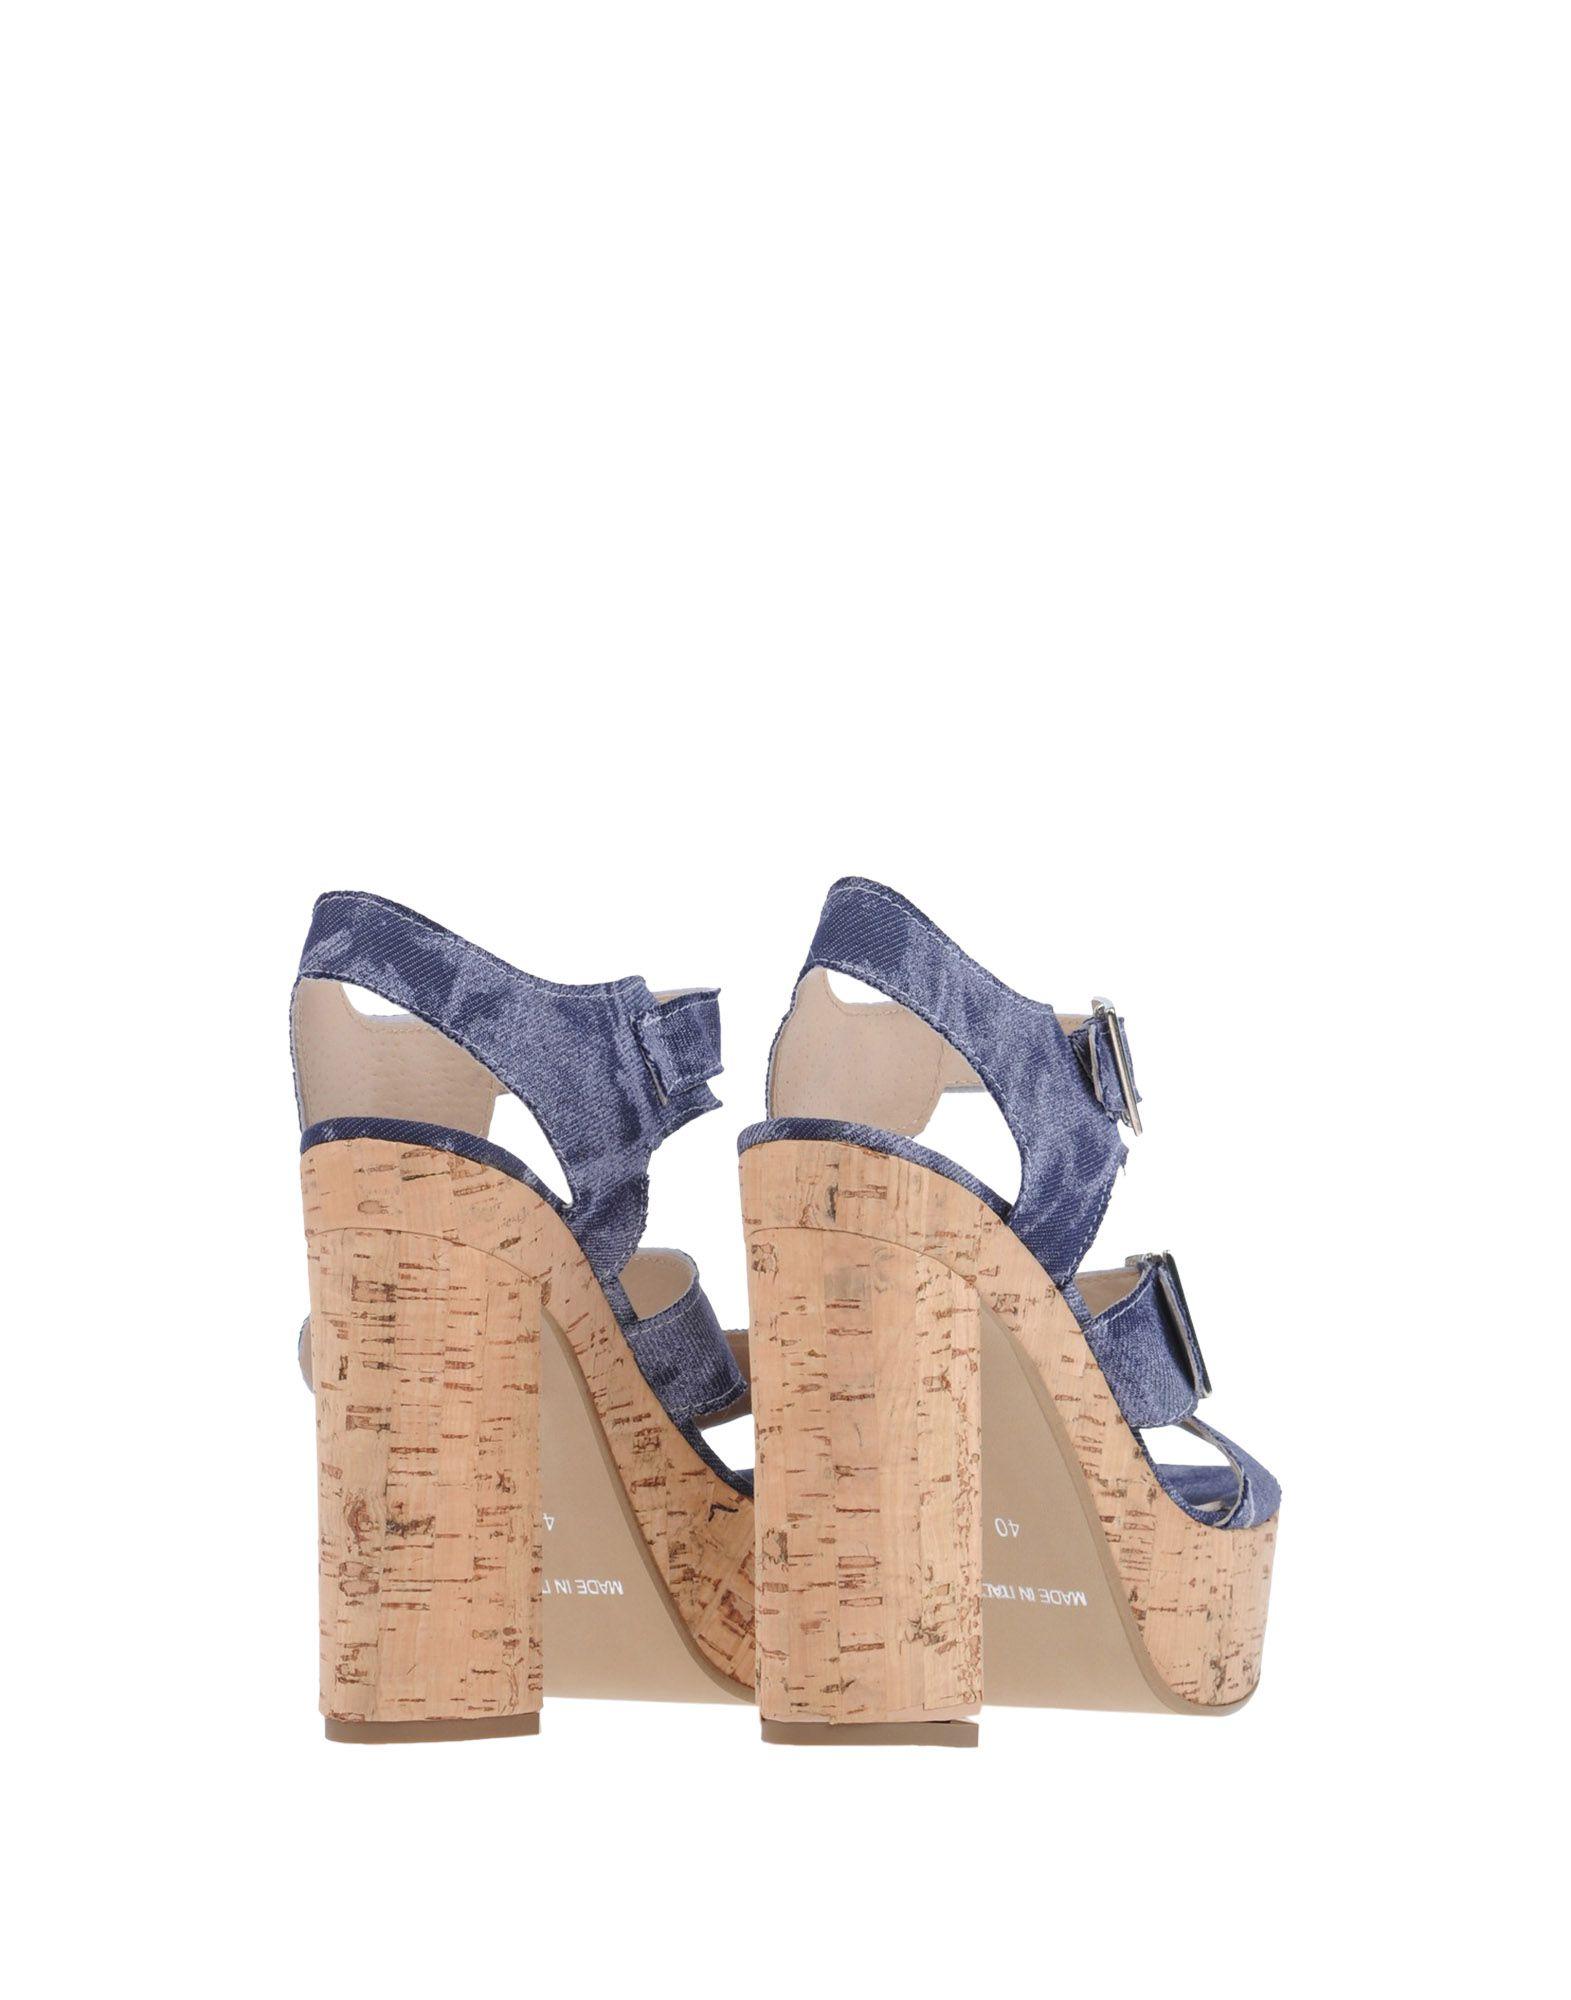 Get It Sandalen Damen   Damen 11241852FB Gute Qualität beliebte Schuhe b32c3c